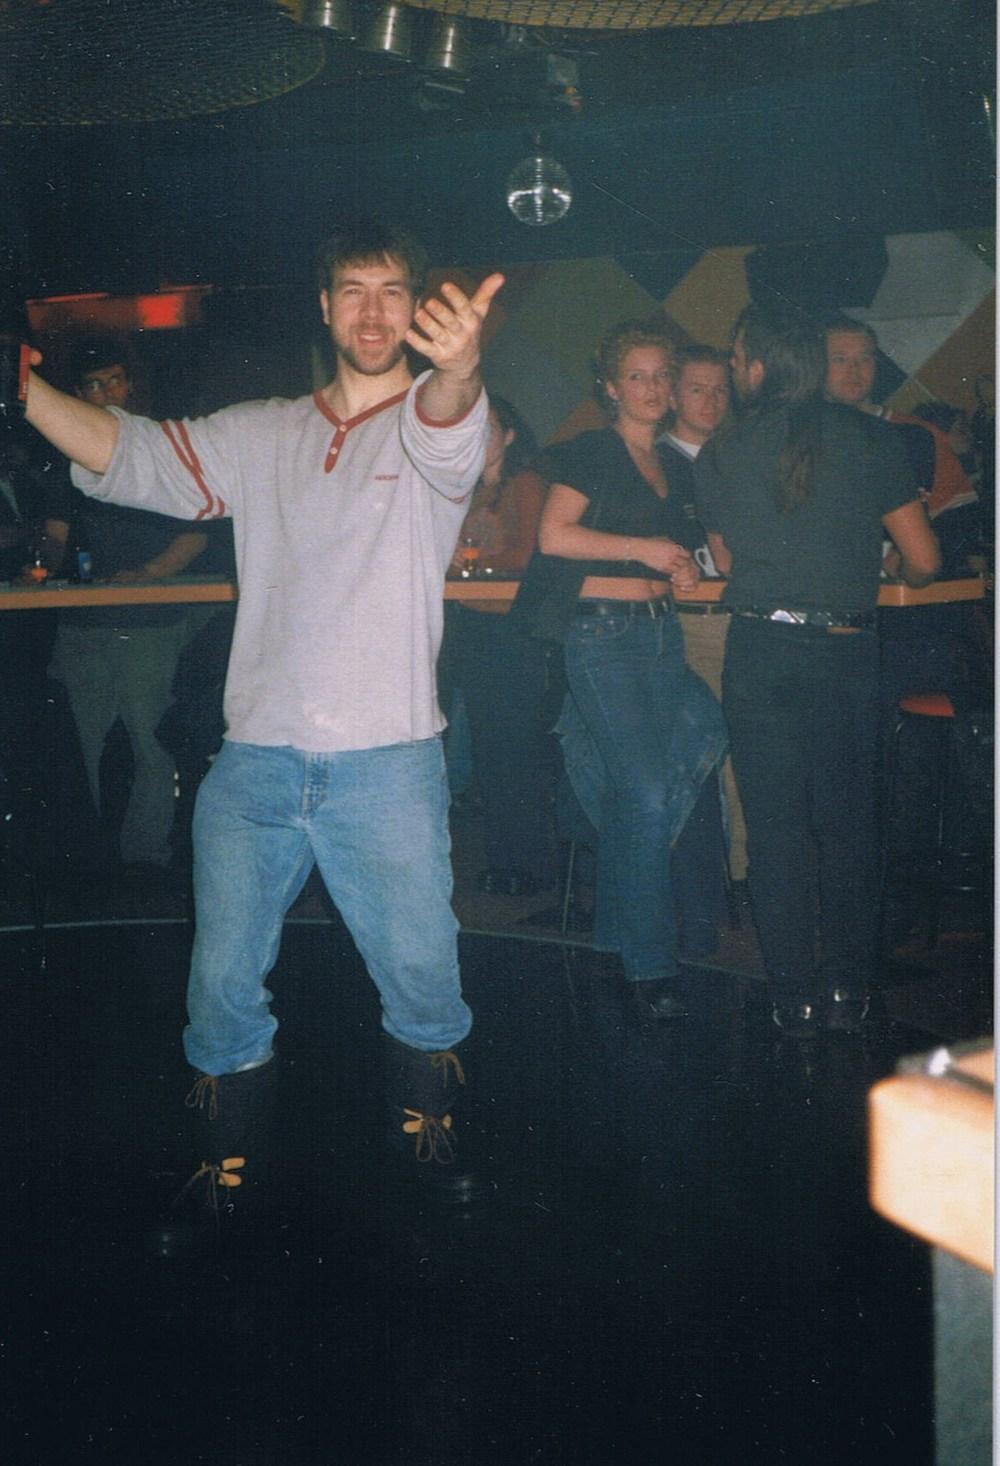 Ray doing his MOON walk on the dance floor